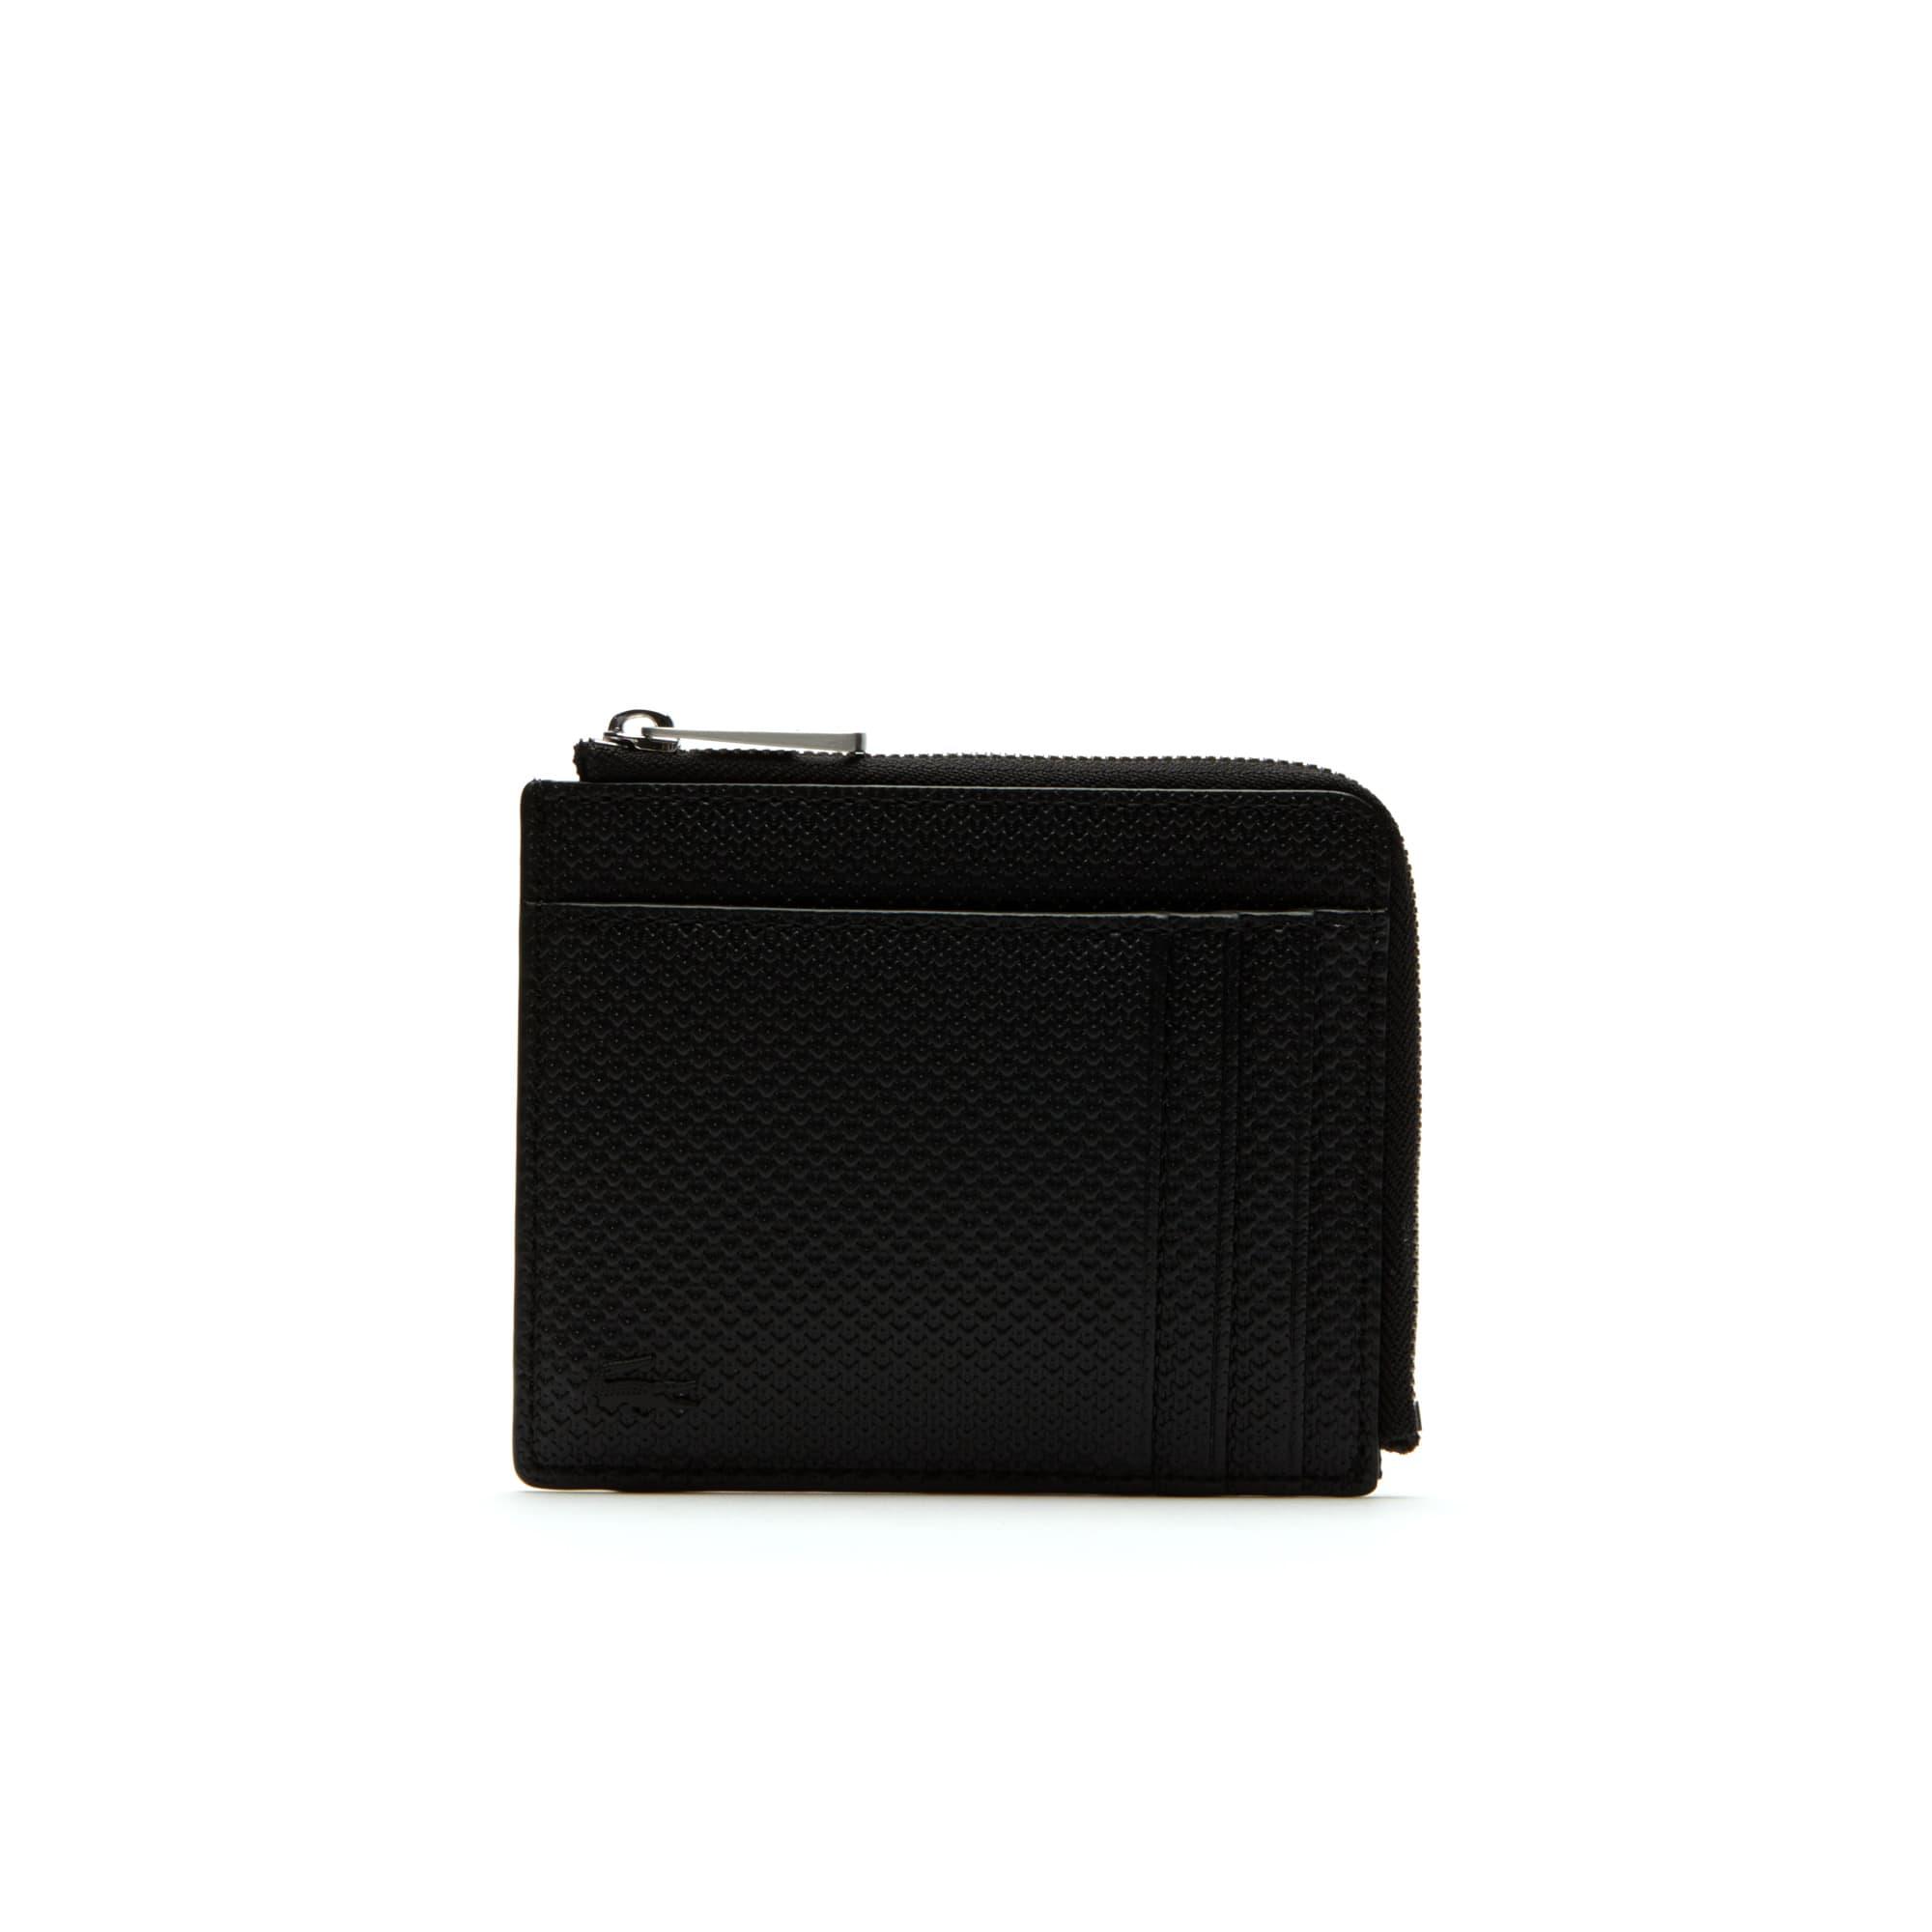 mens chantaco zippered matte piqu leather card holder - Leather Card Holder Wallet